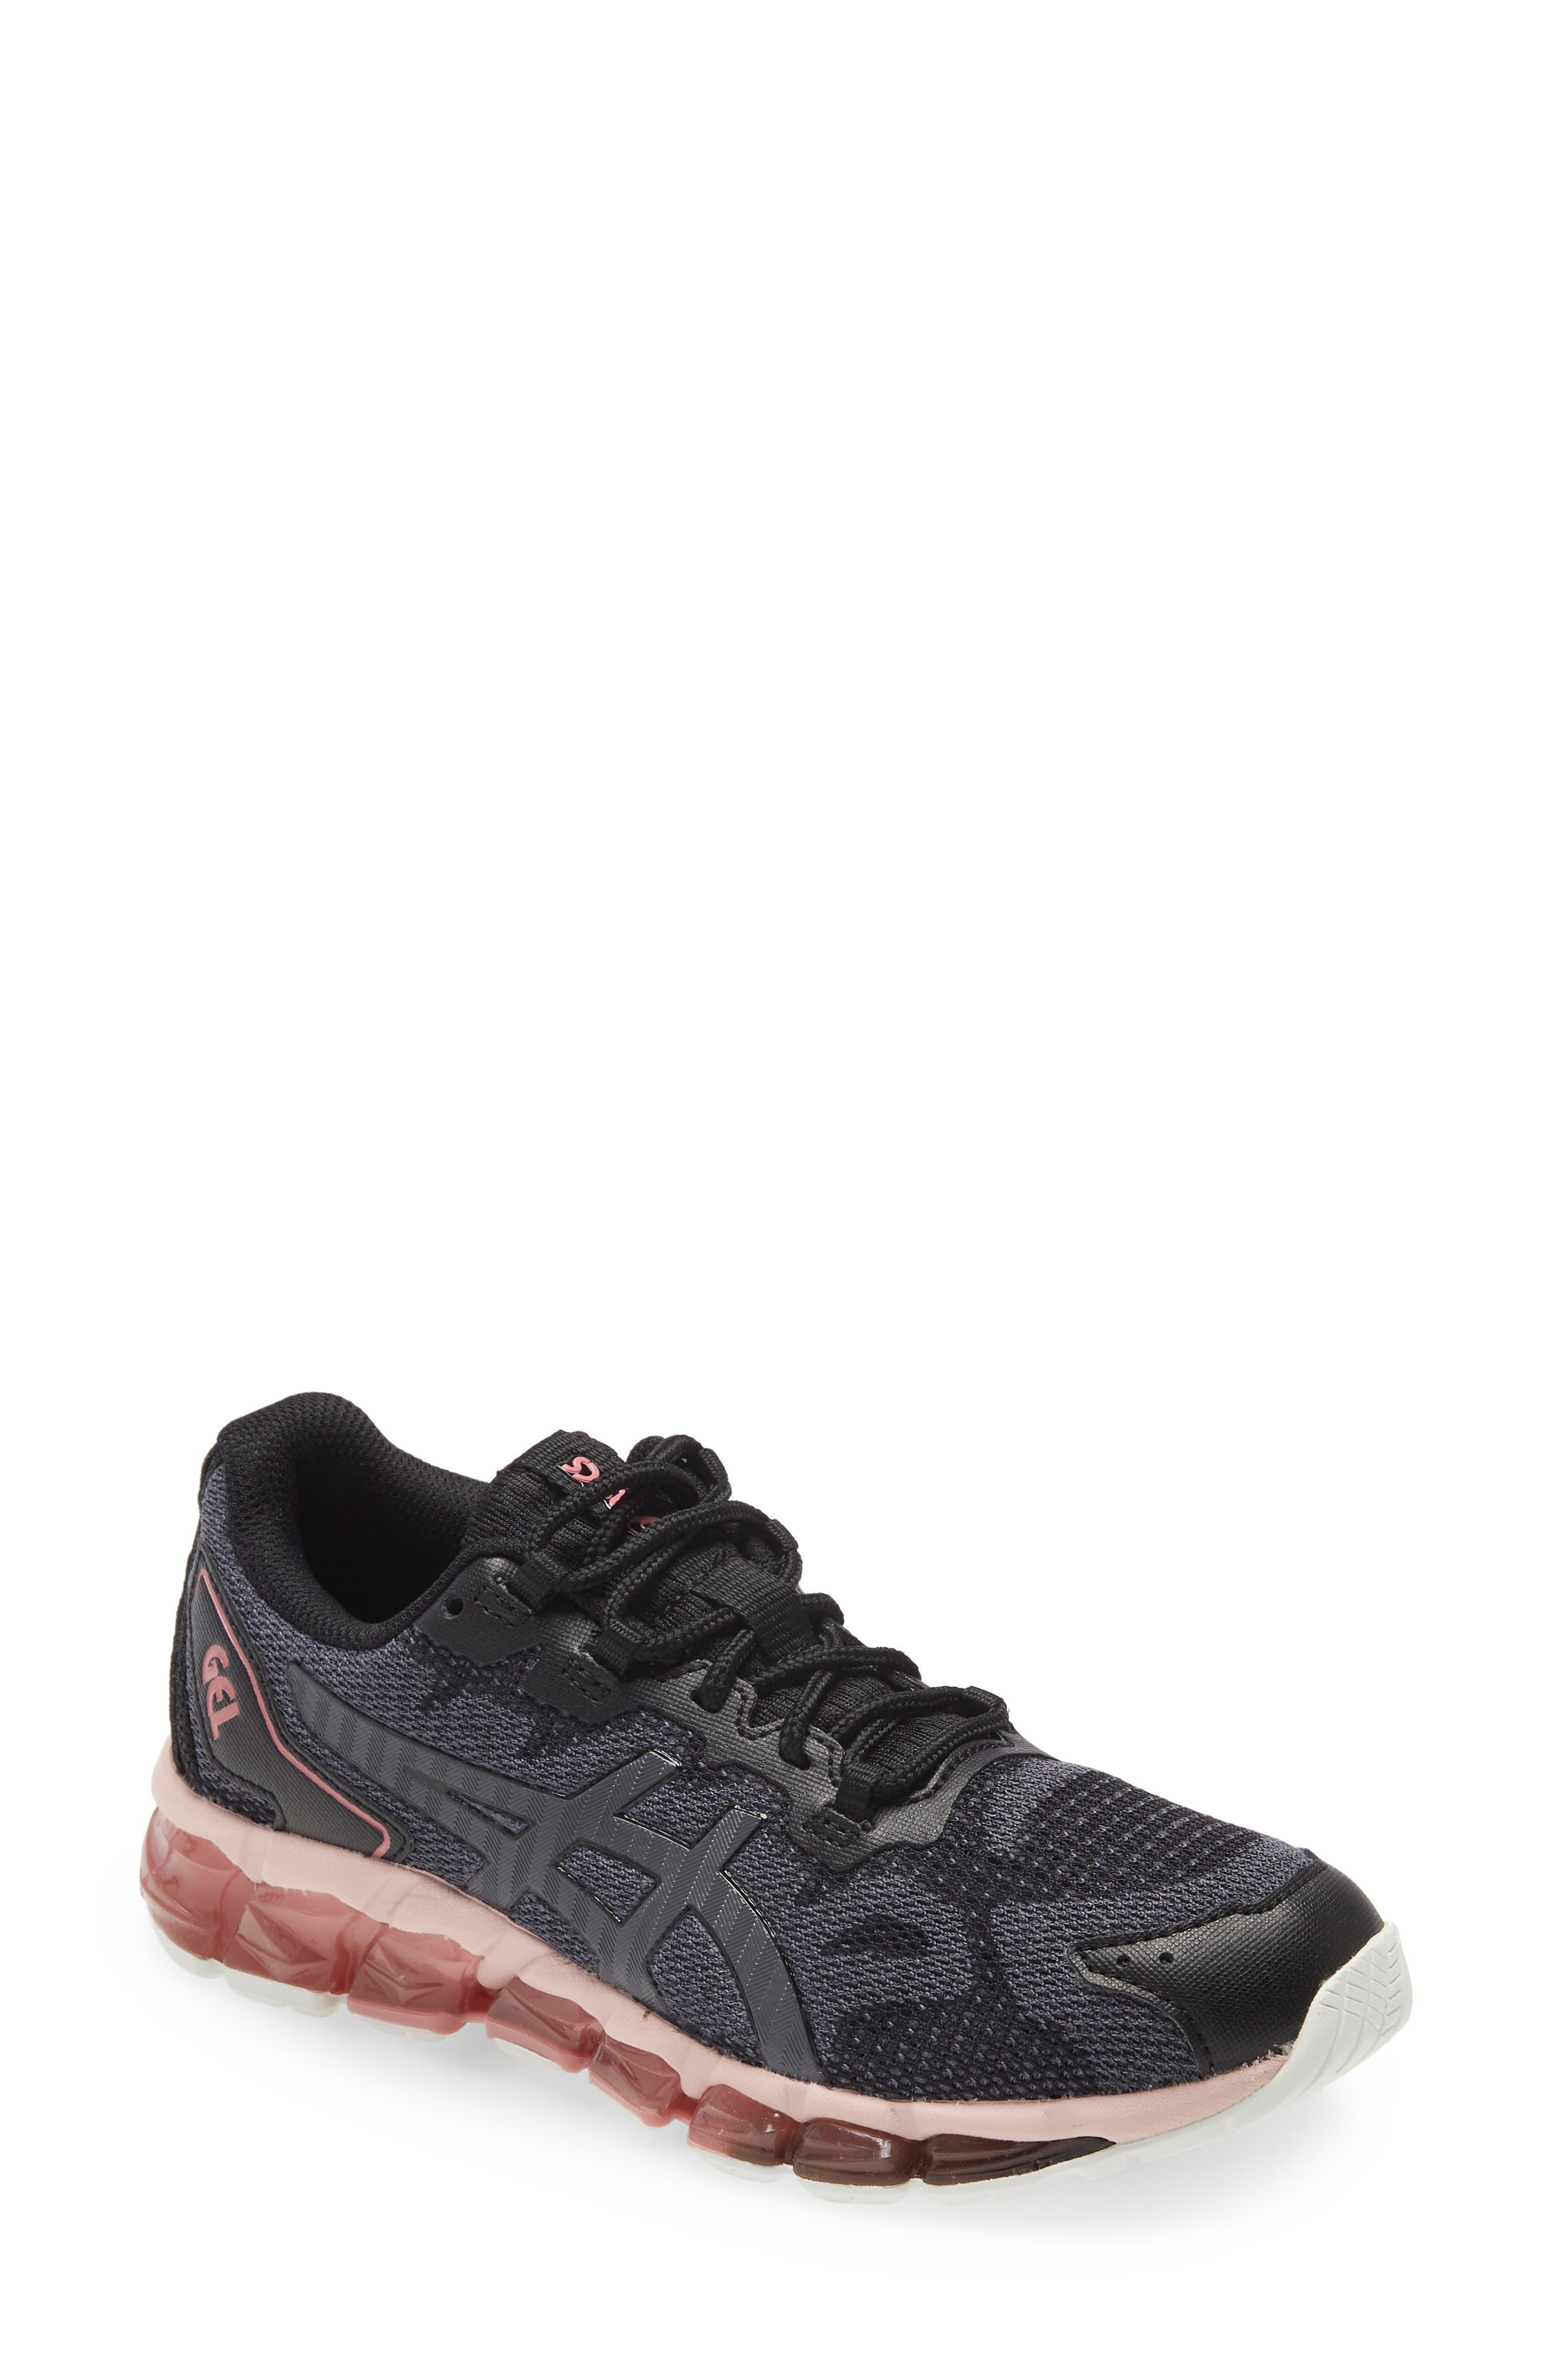 Women's Asics Gel-Quantum 360 6 Sneaker